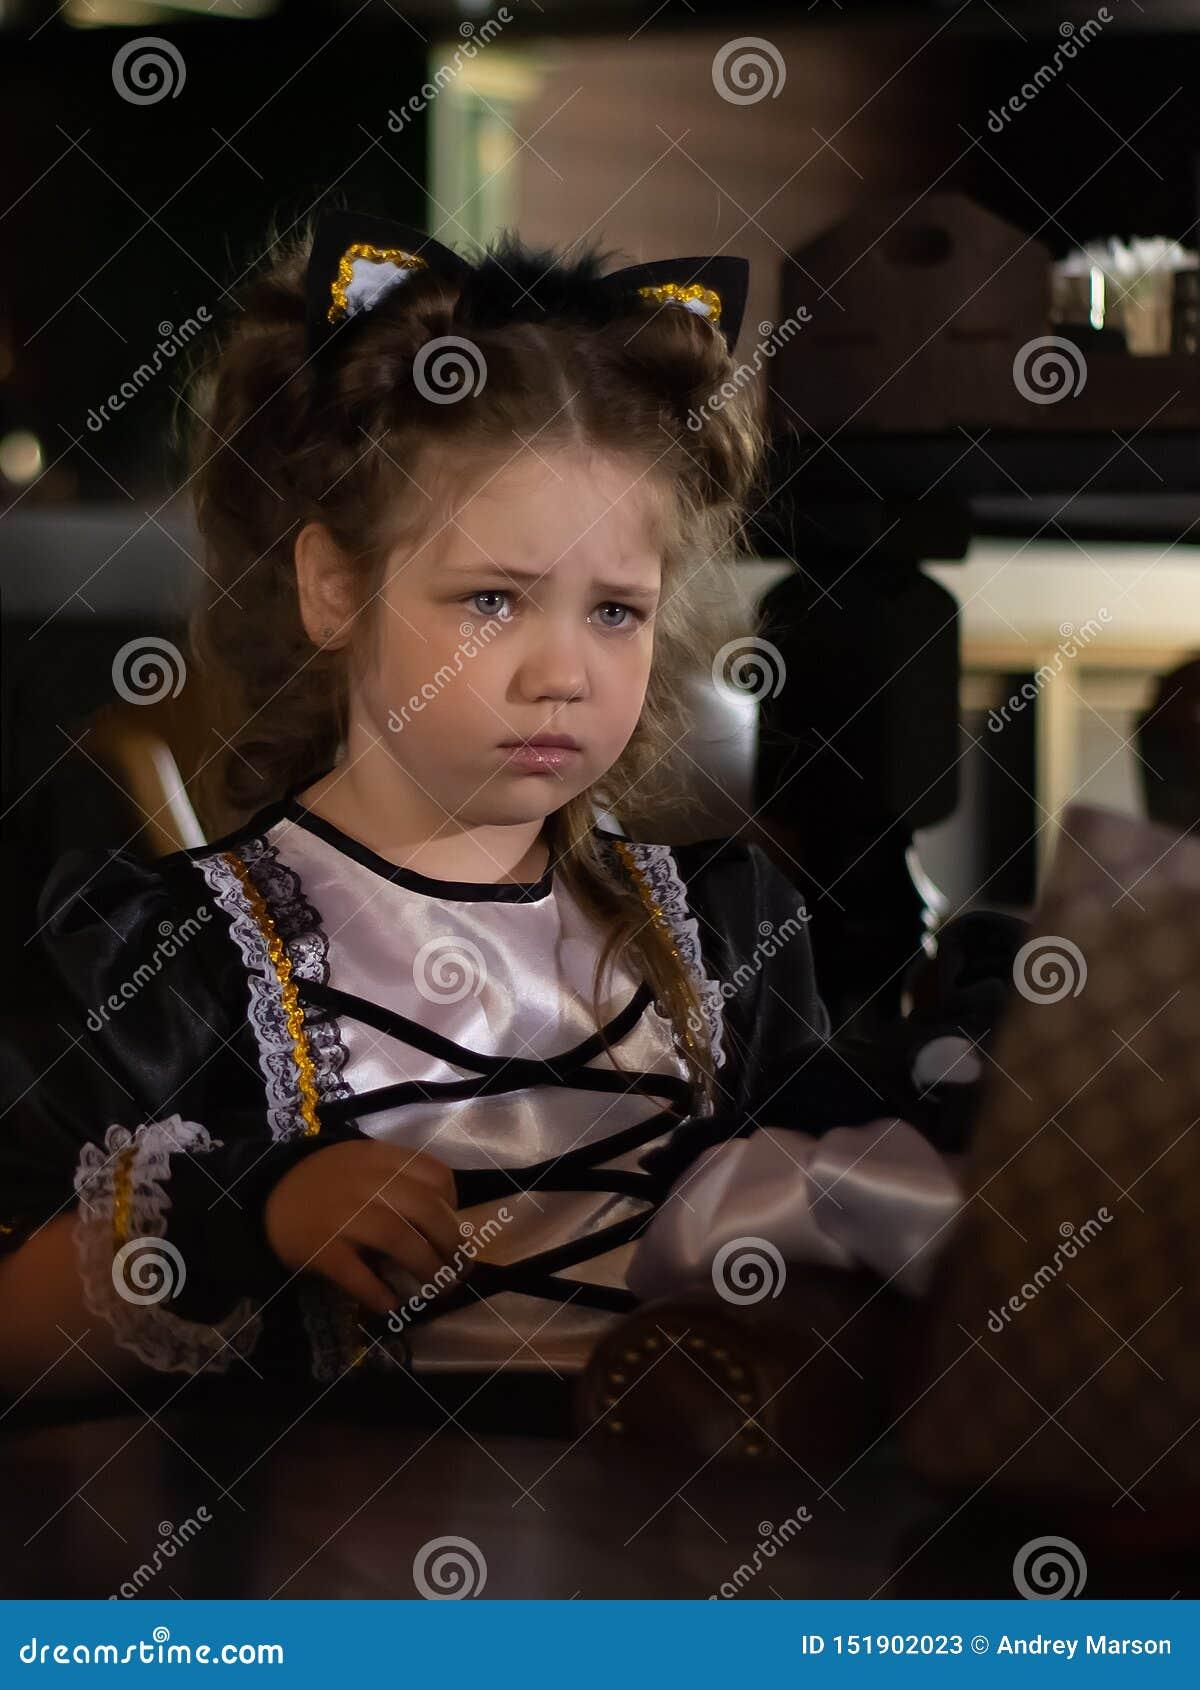 Sad look of little girl. Close up portrait